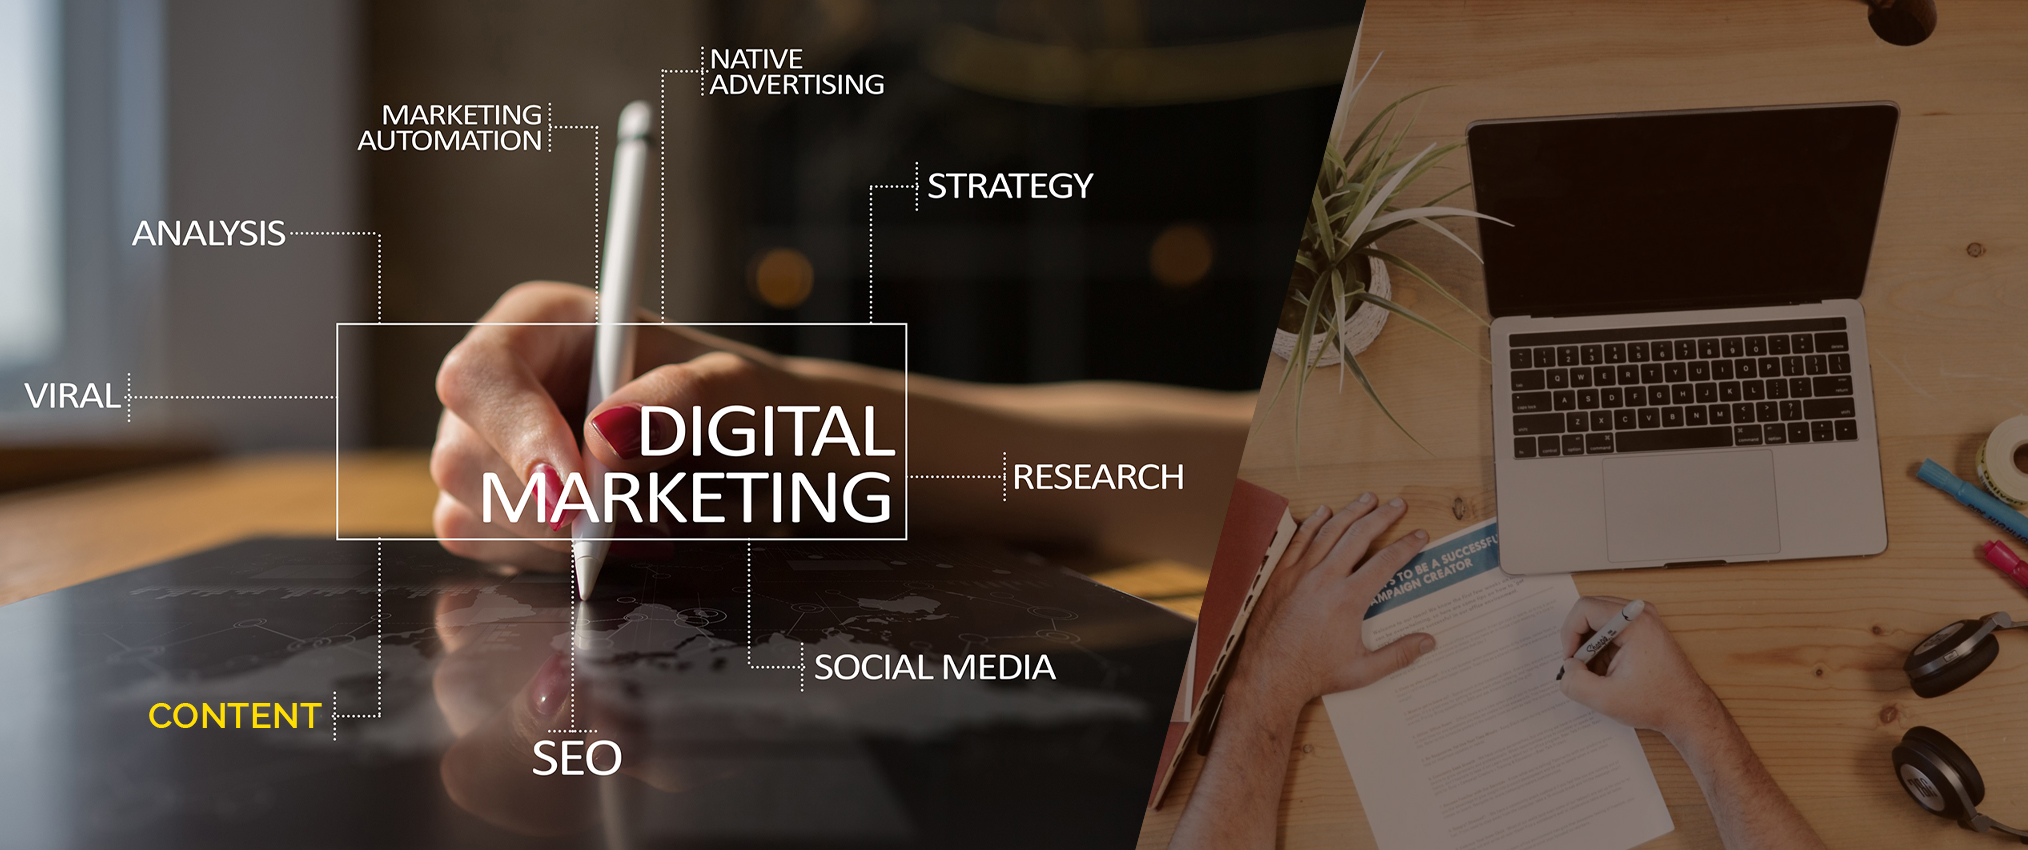 Content Marketing: The Lifeblood of Digital Marketing